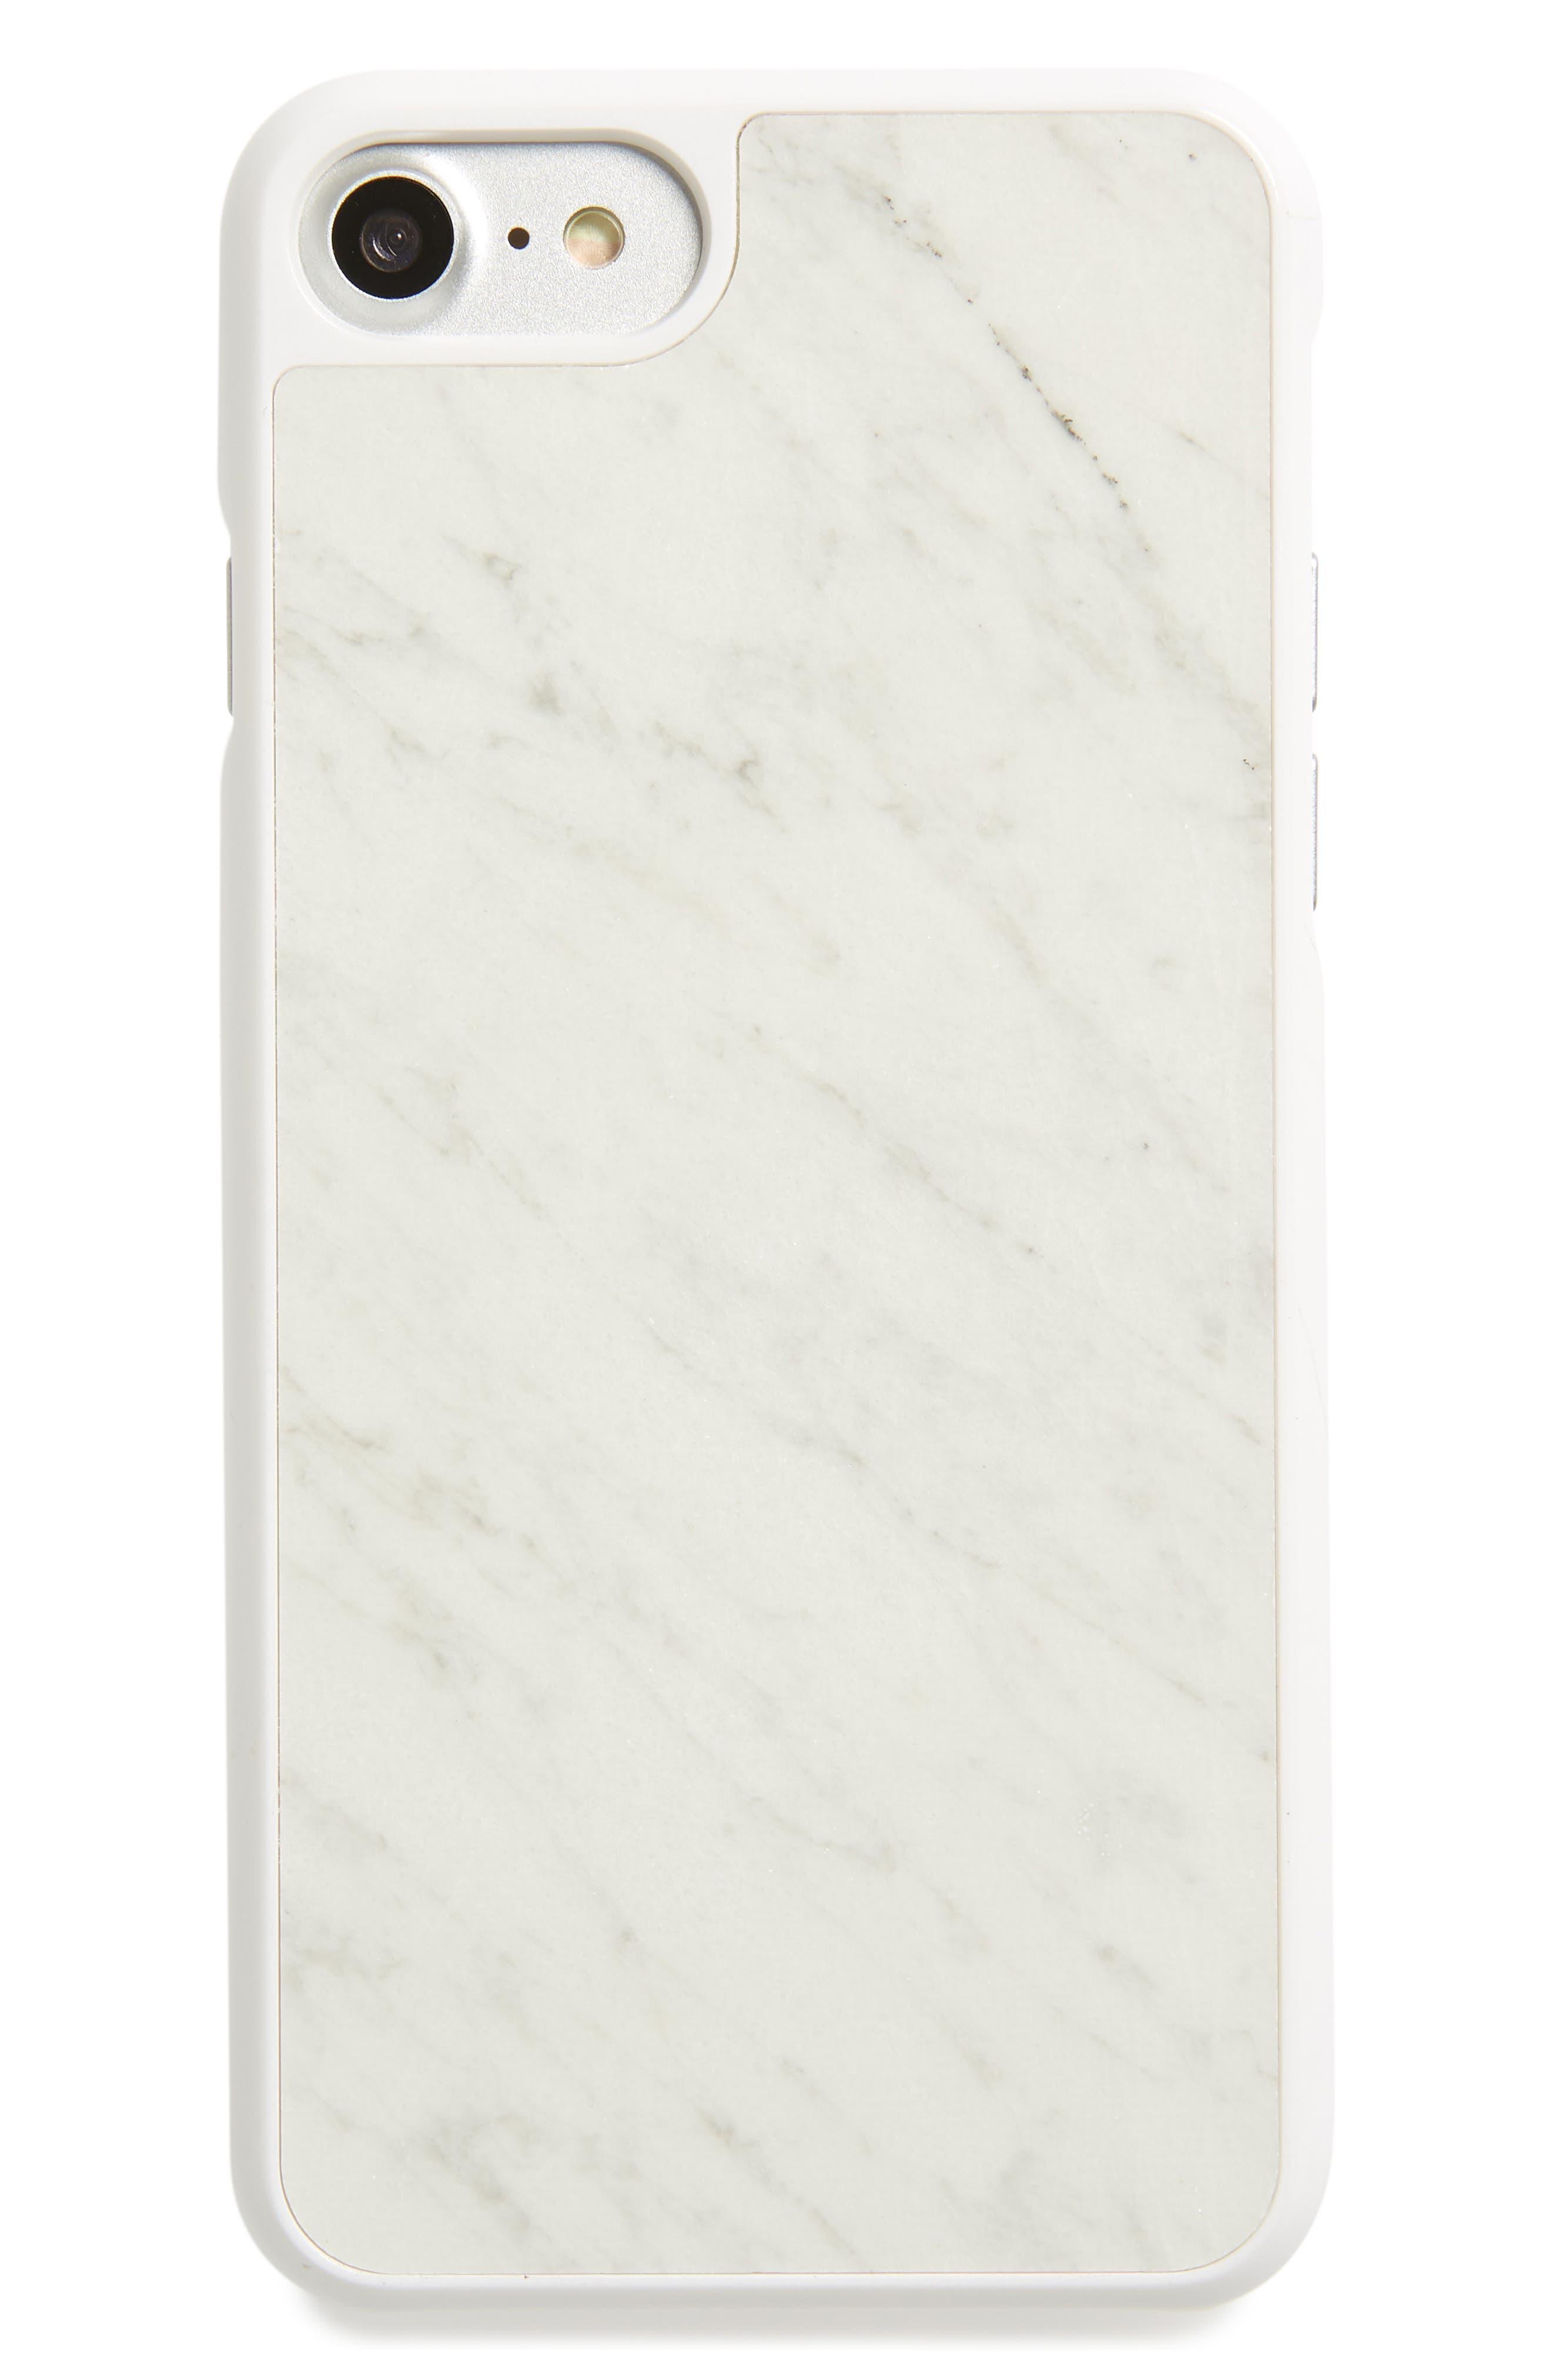 Genuine White Marble iPhone 6/6s/7/8 & 6/6s/7/8 Plus Case,                             Main thumbnail 1, color,                             White